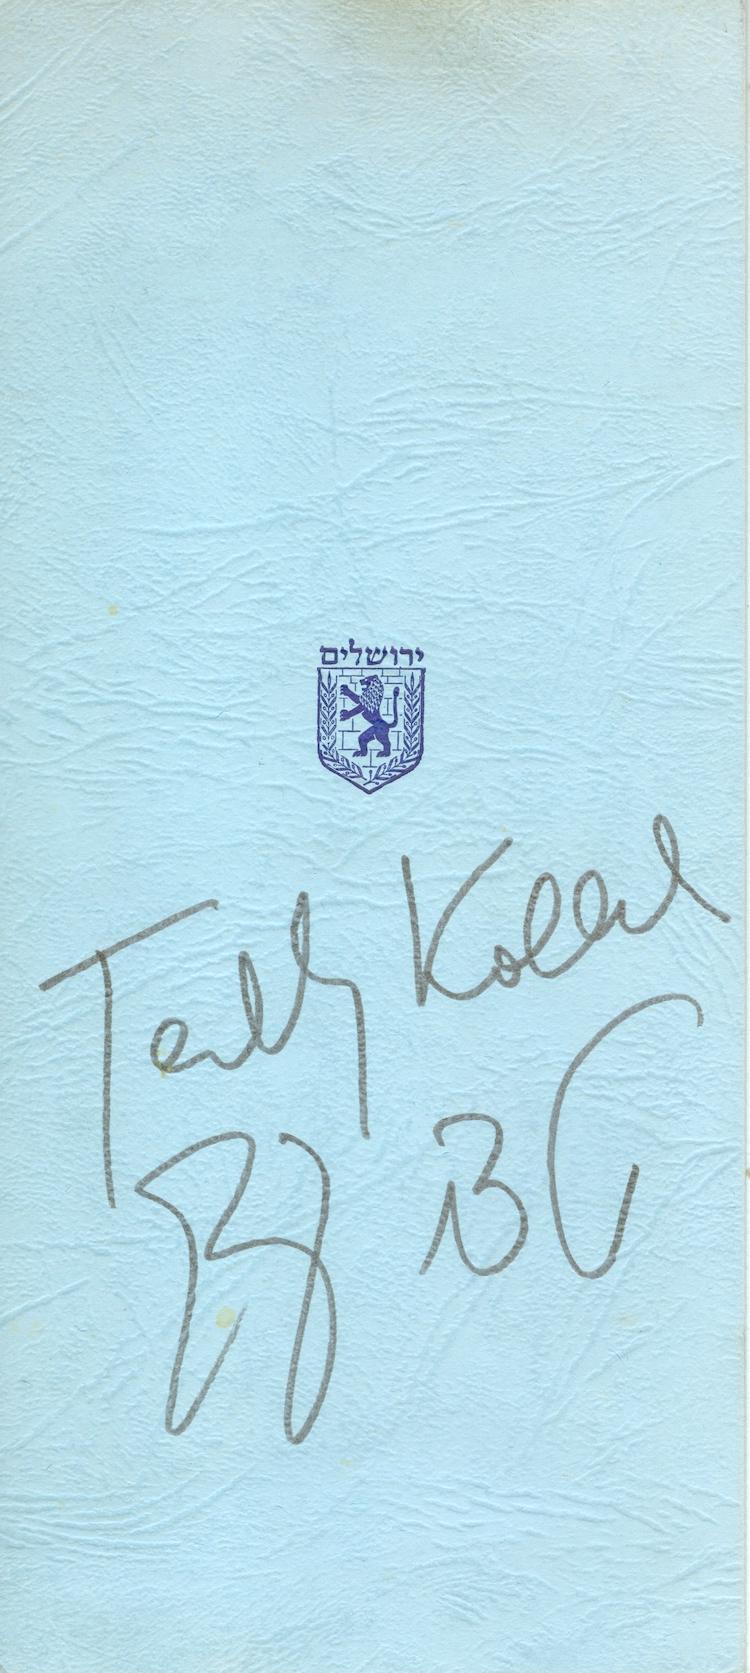 Lot 615 - judaica autographs -  Negev Holyland 94th Holyland Postal Bid Sale